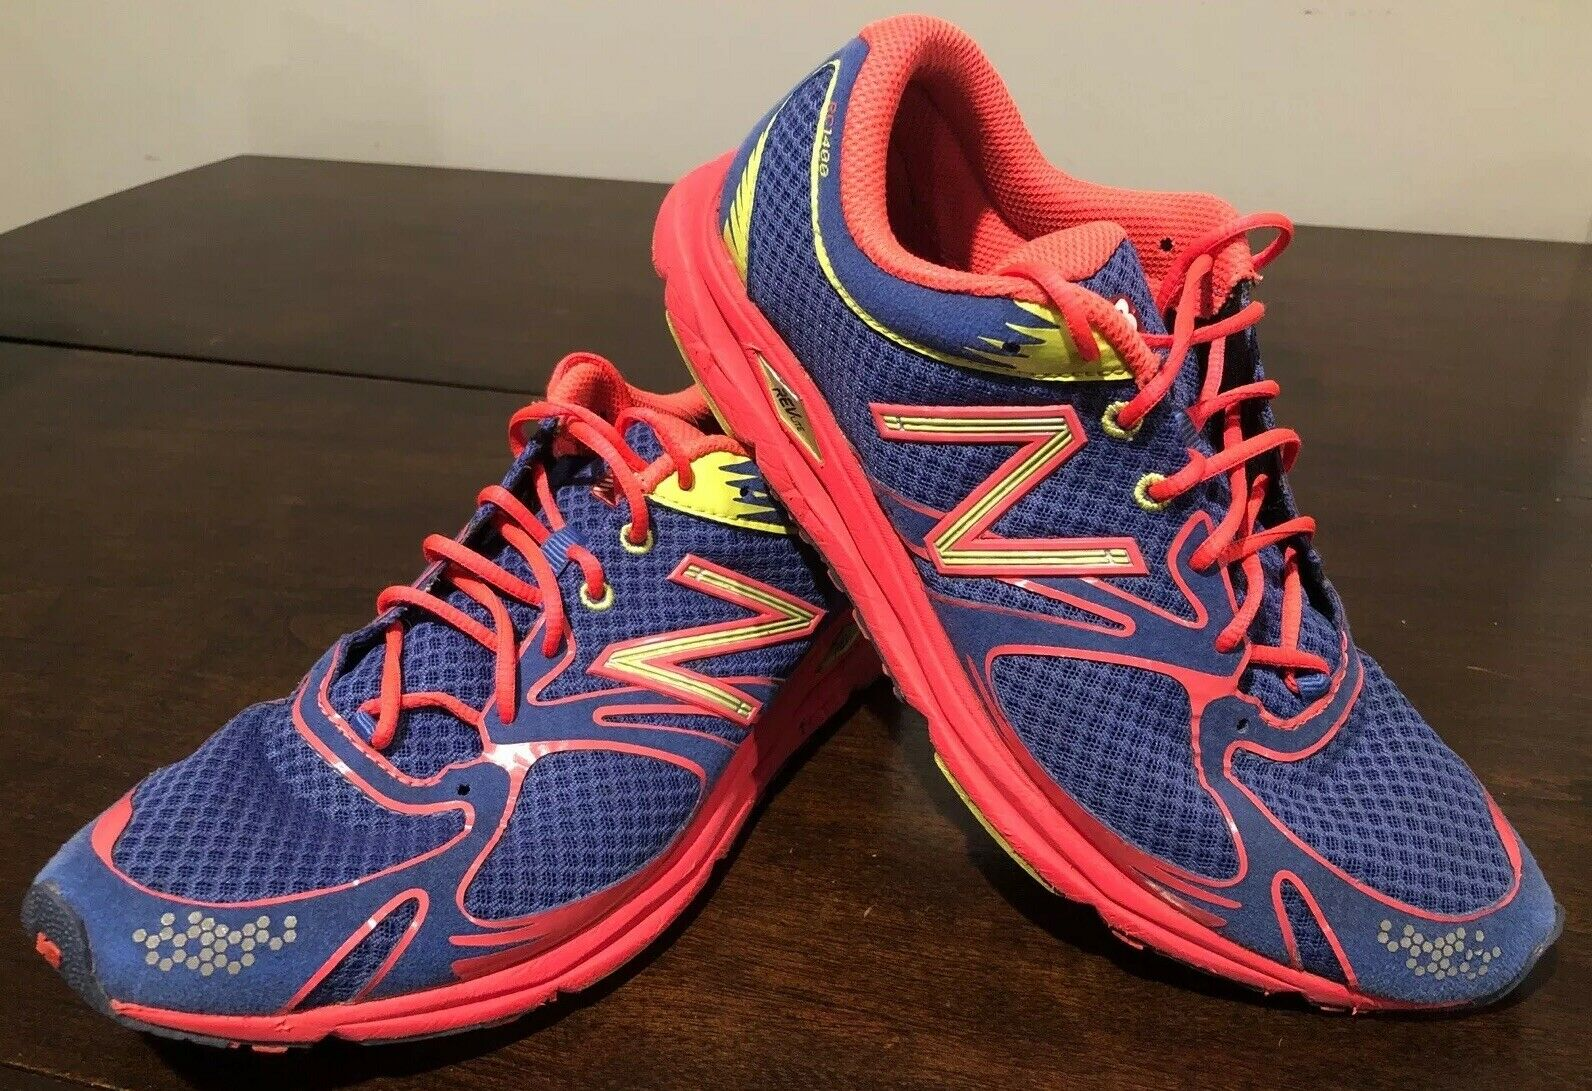 New Balance Revlite Rc1400 Chaussures Femme 9.5 Wr1400bp